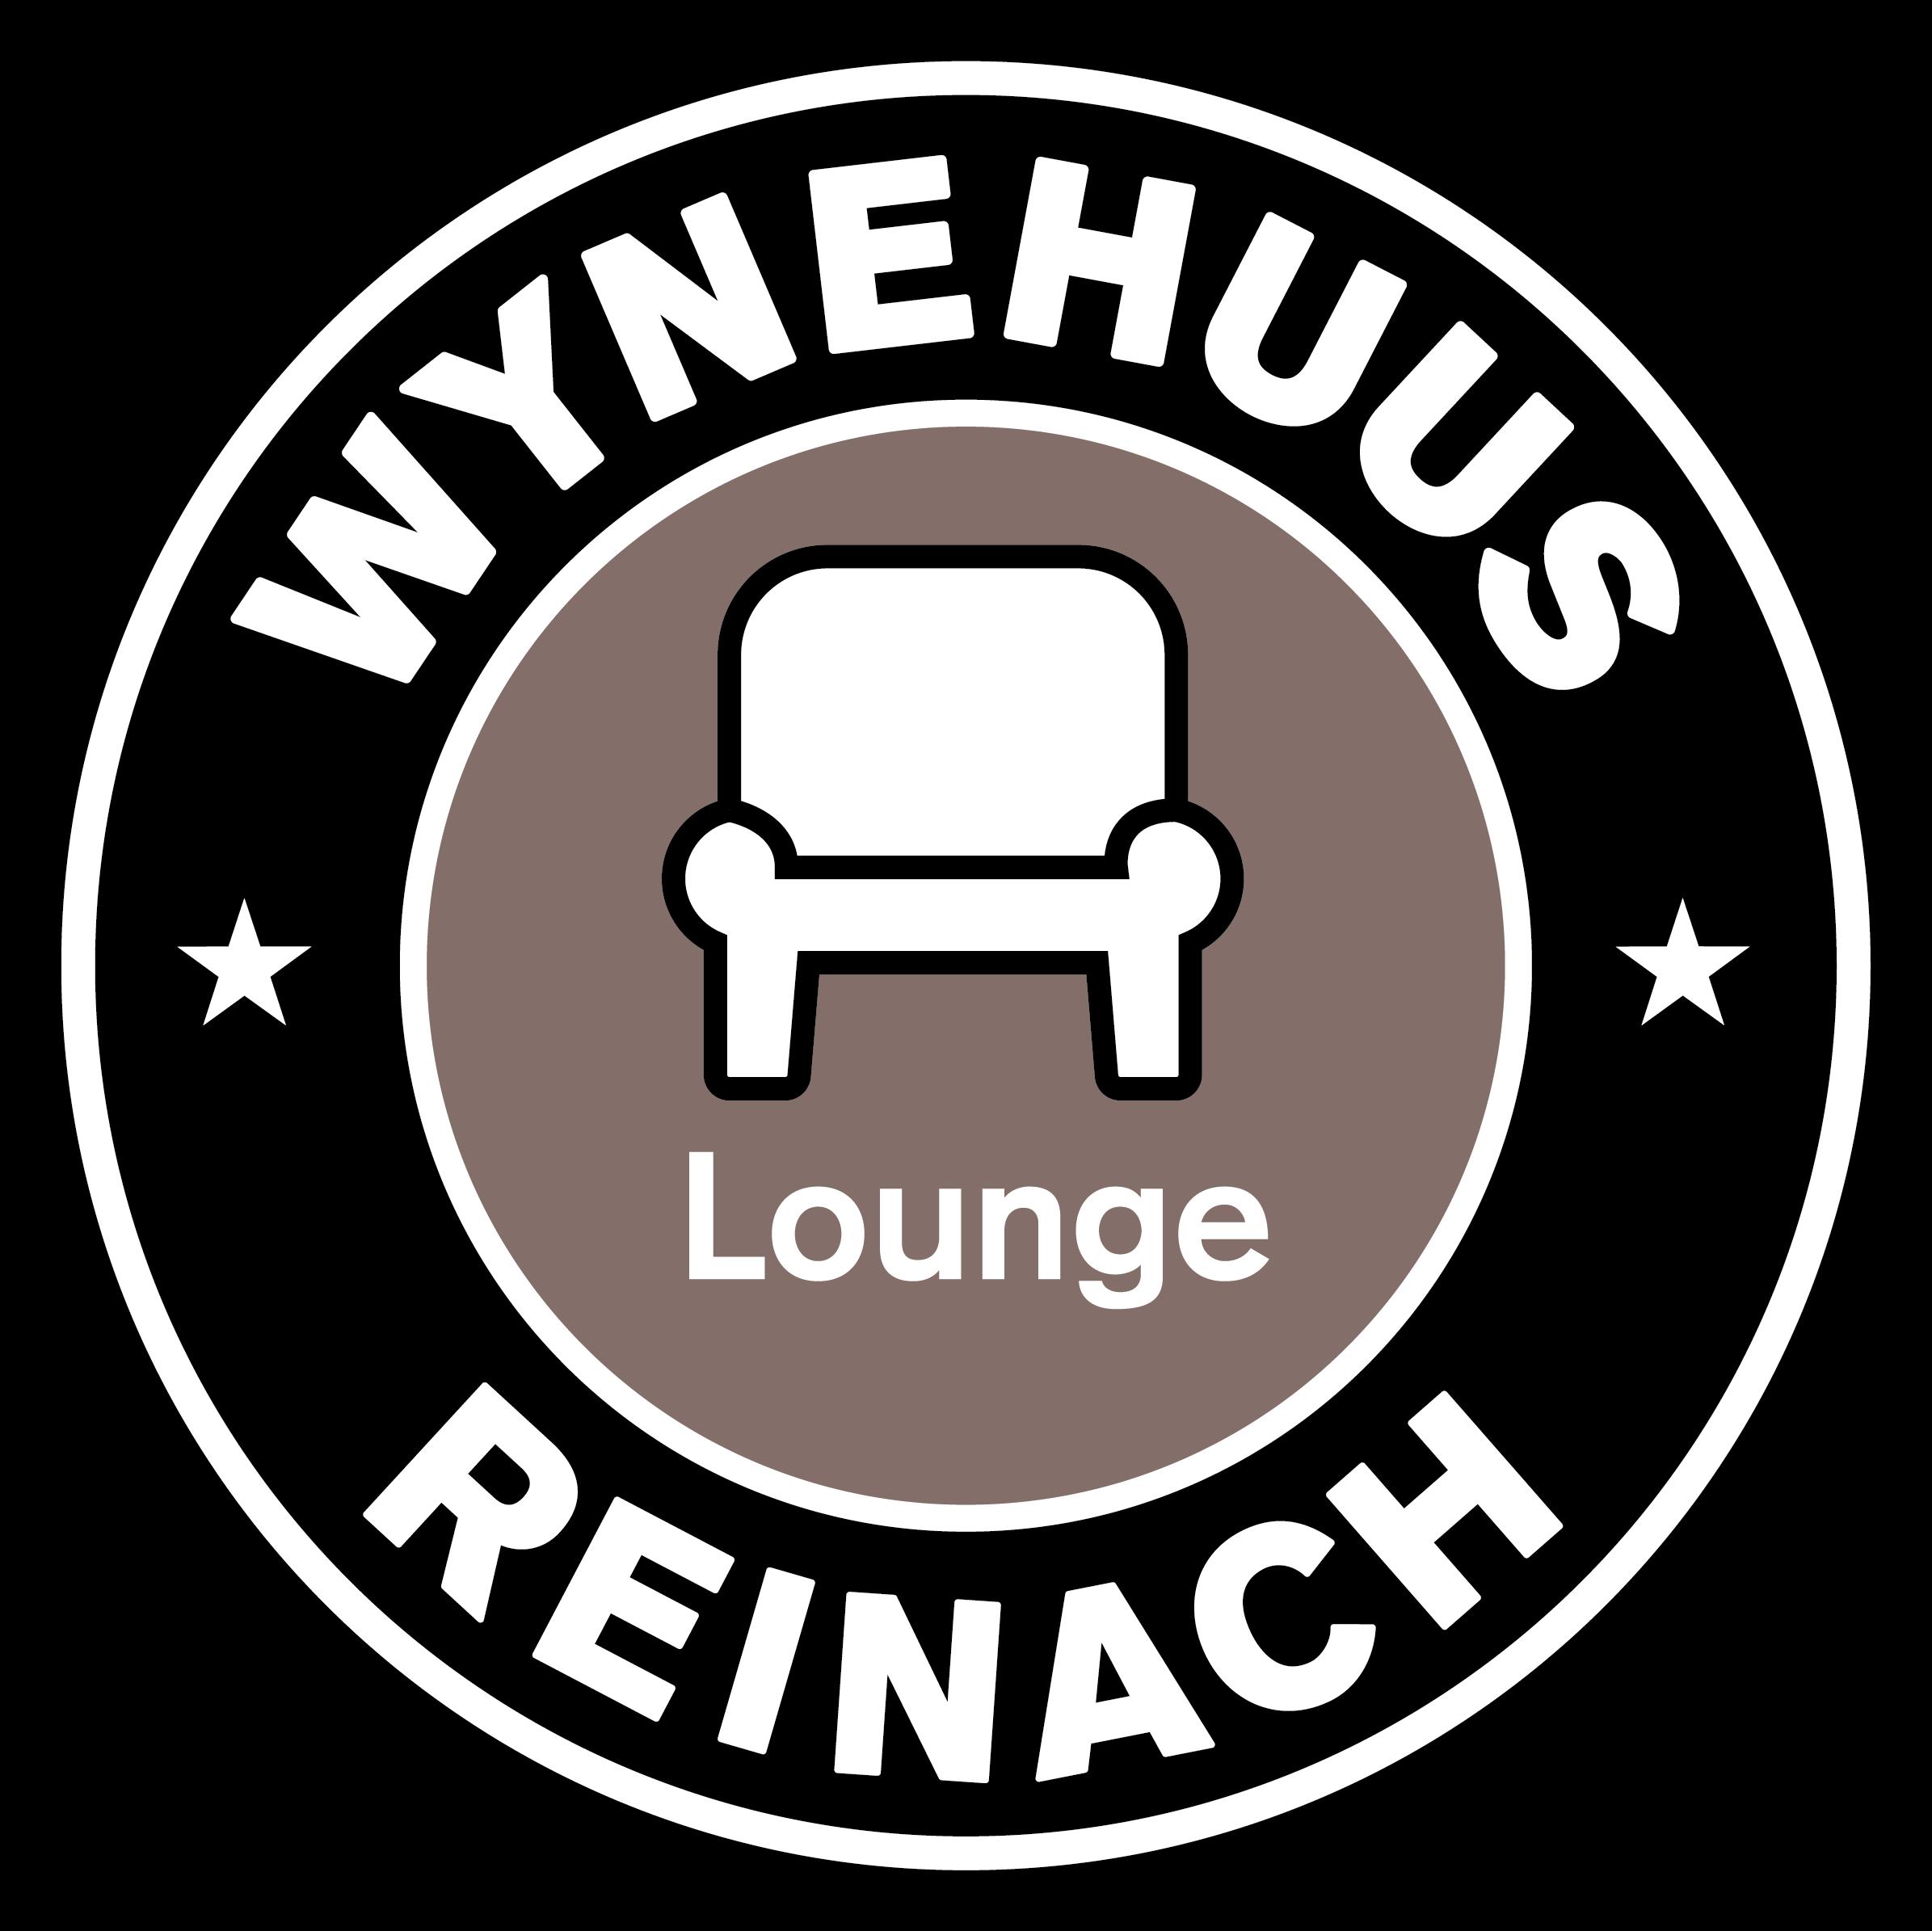 Wynehuus_Lounge